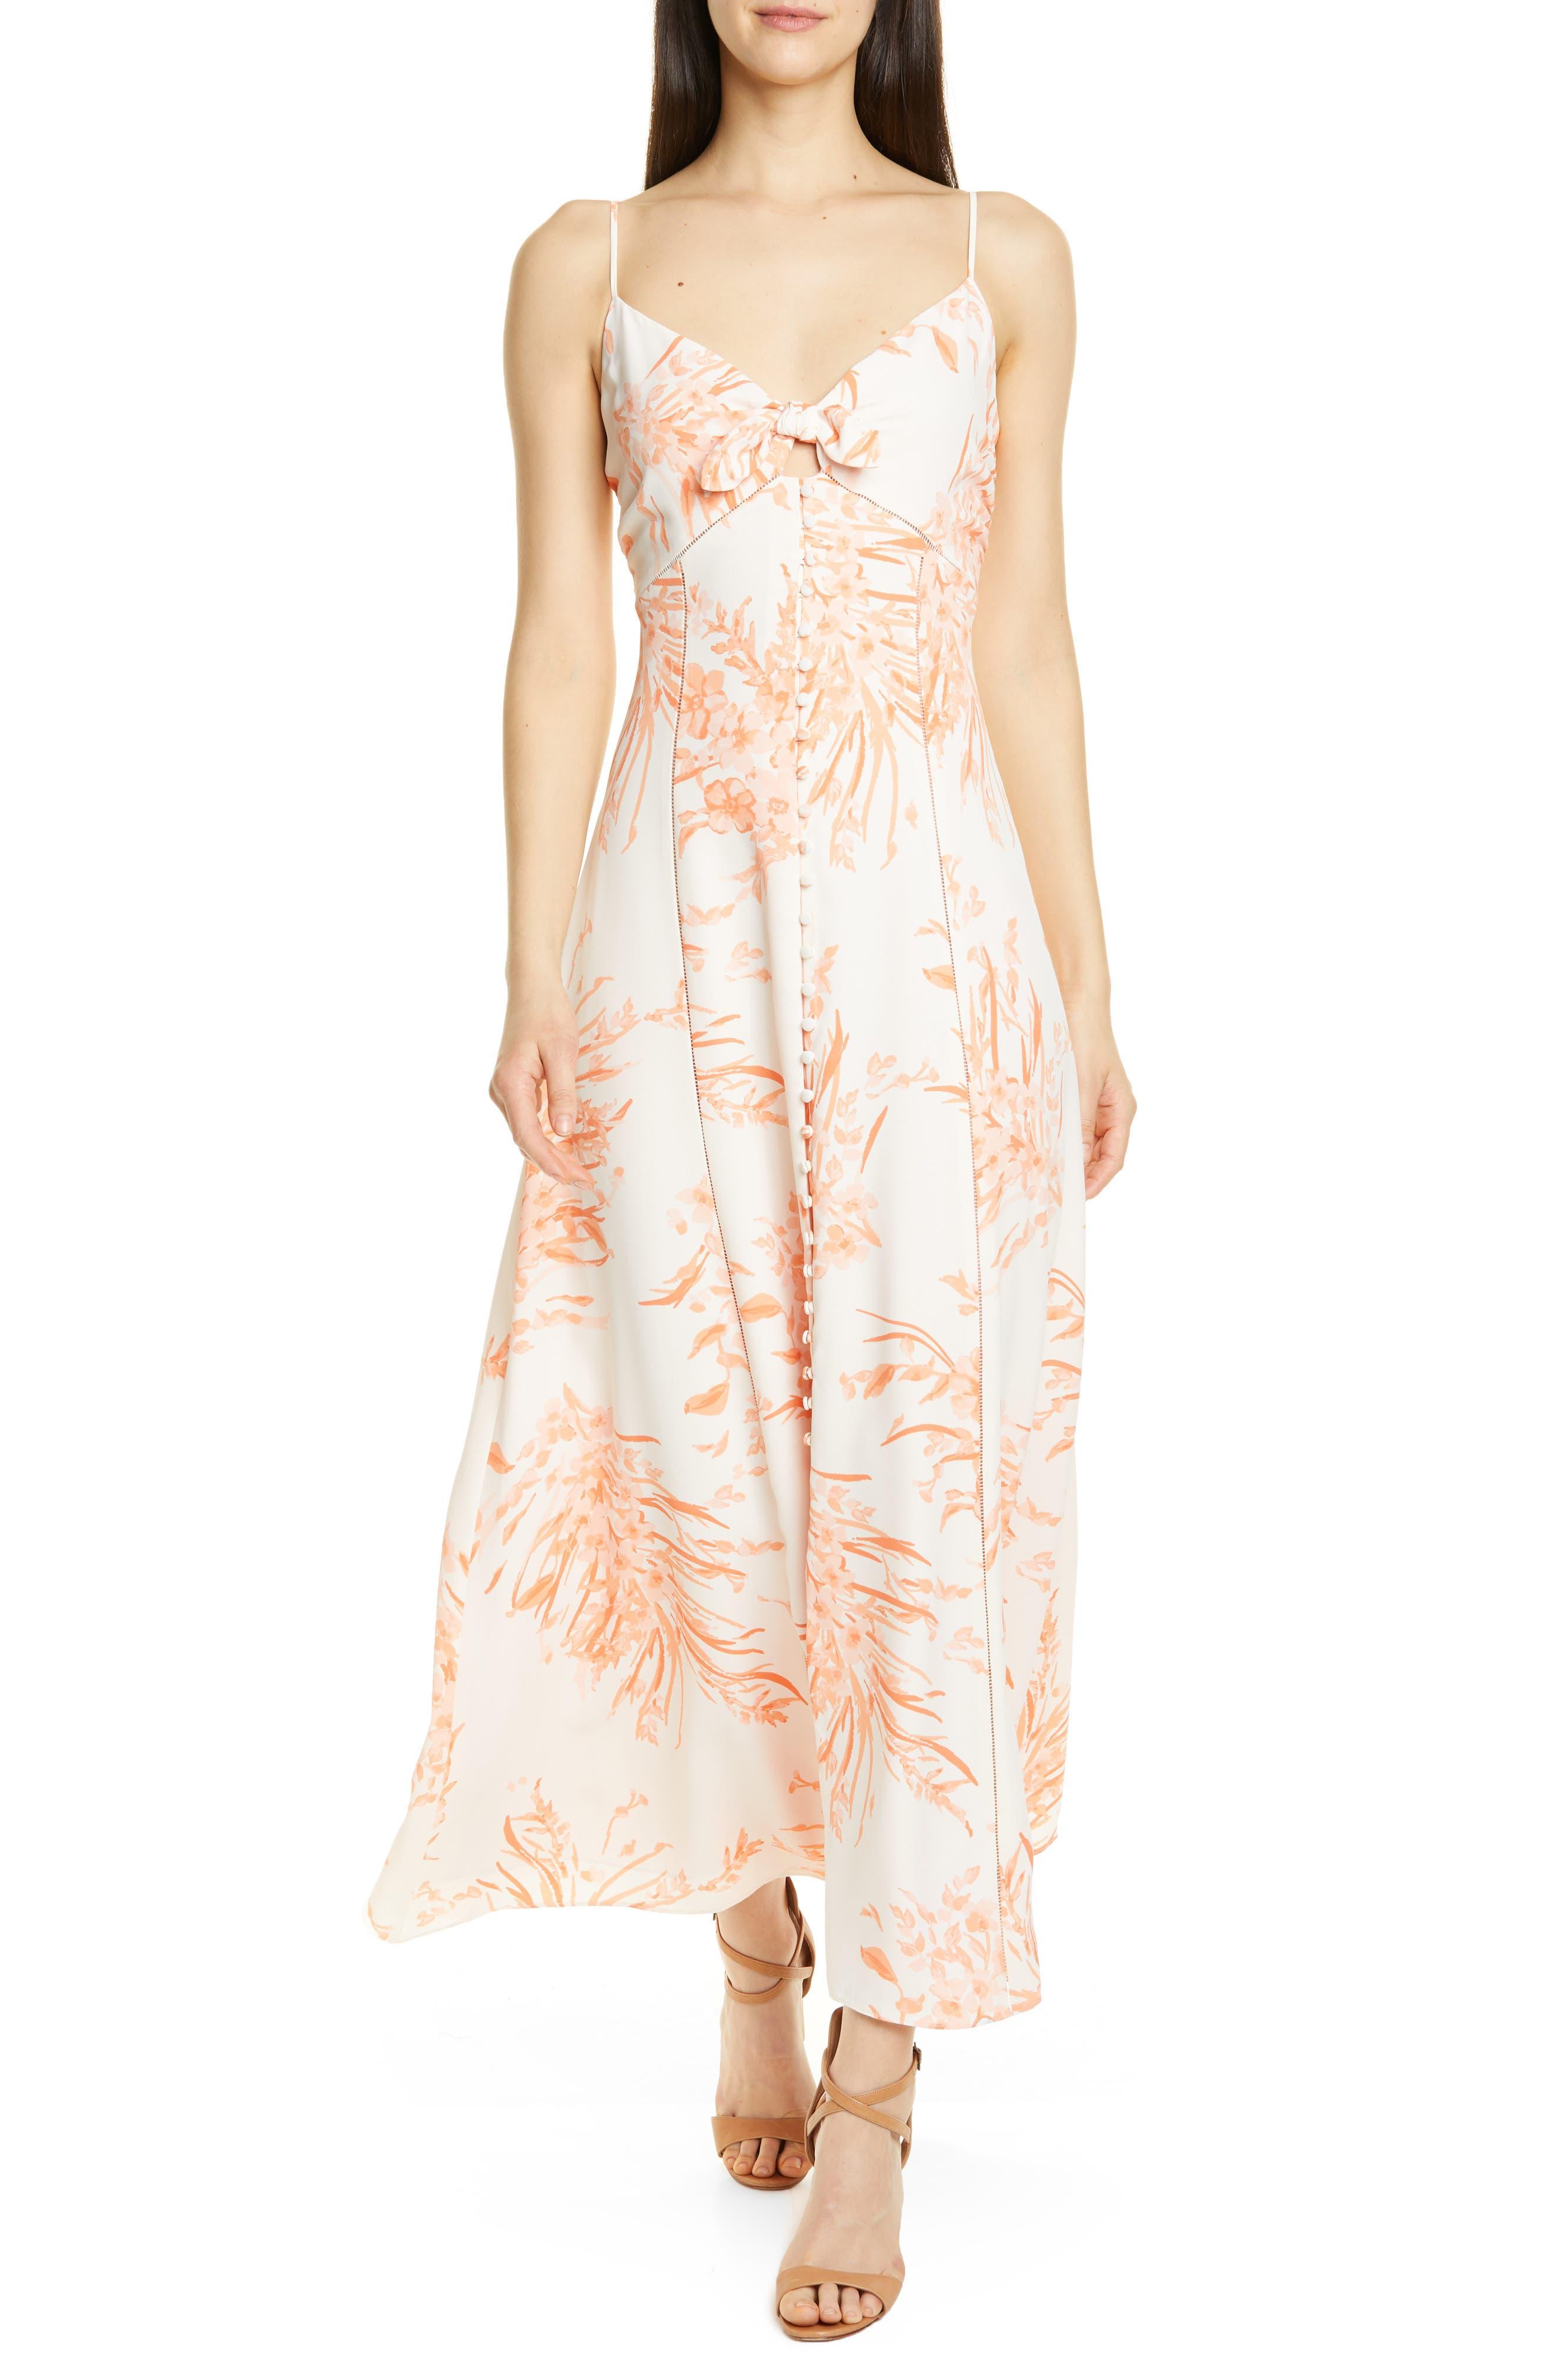 Joie Almona Floral Print Button Front Maxi Dress, White